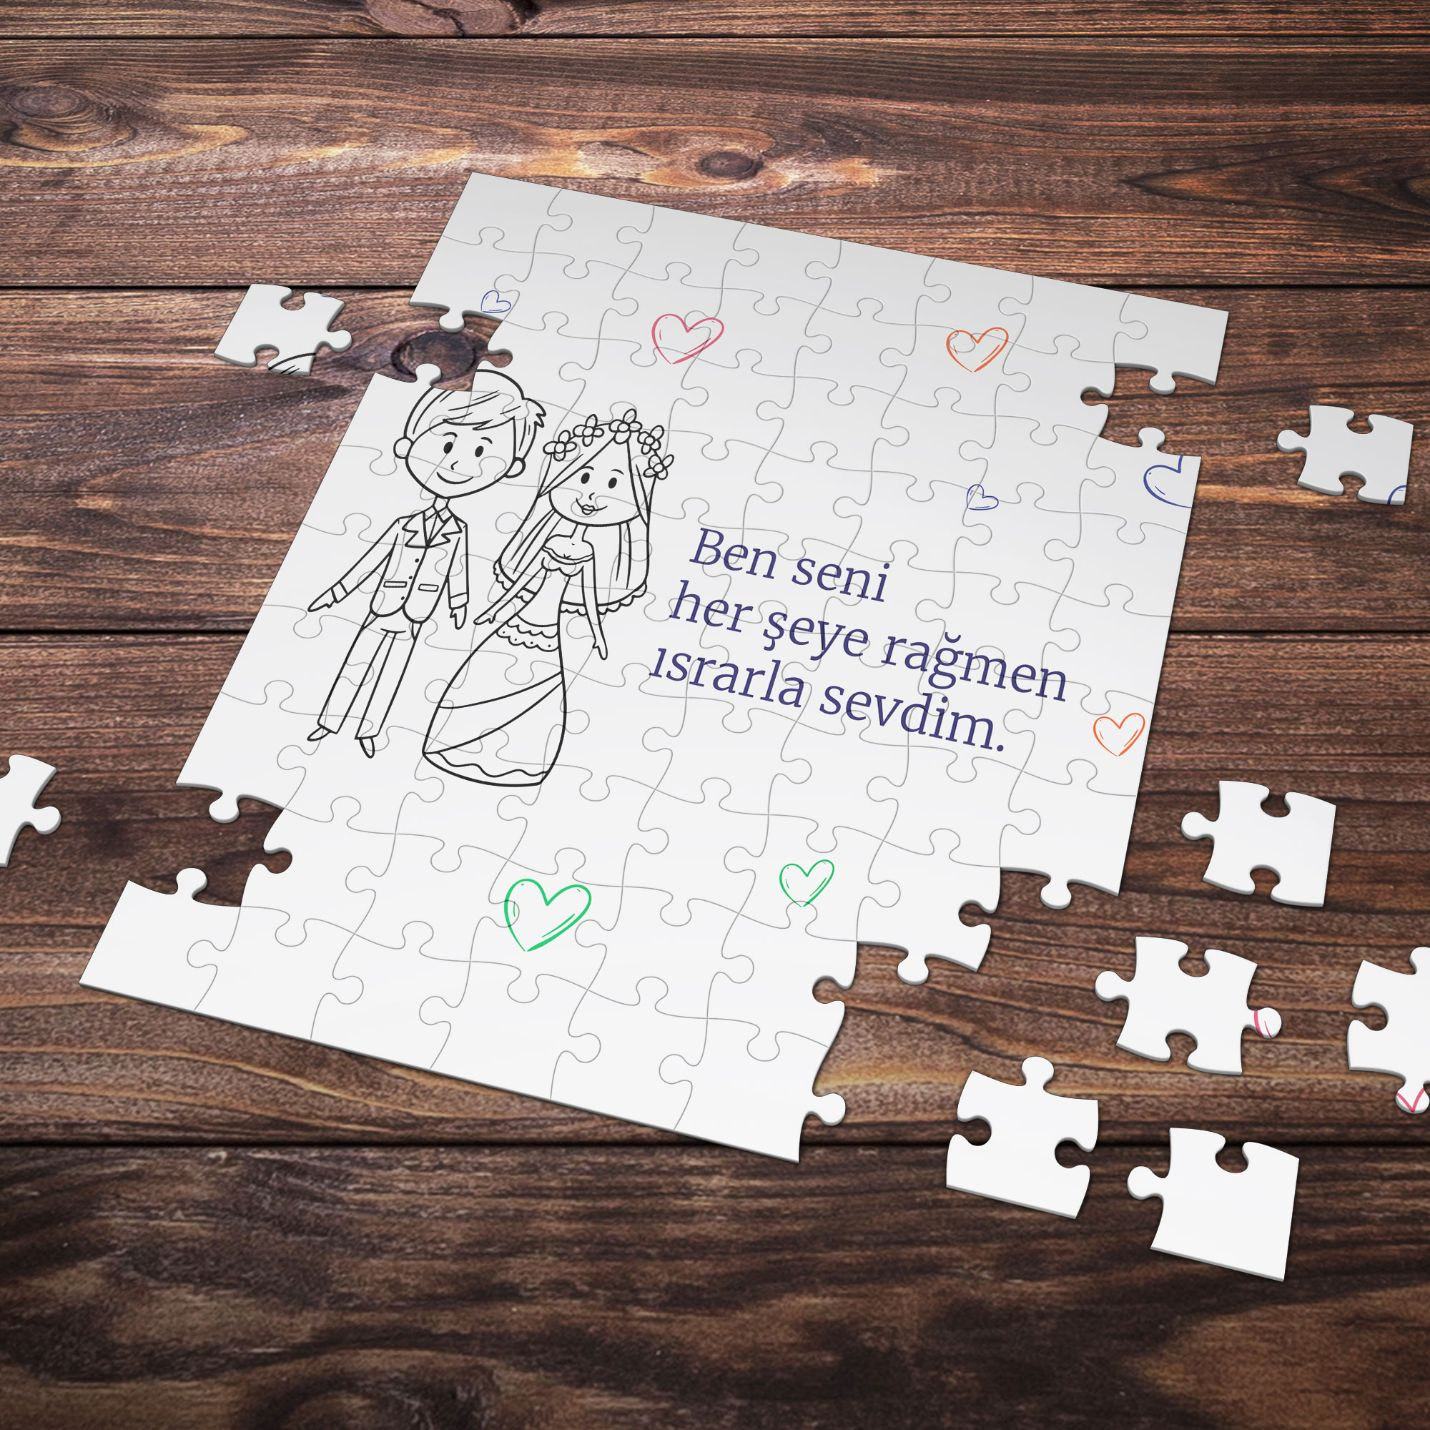 99 Parça Romantik Tasarımlı Puzzle Yapboz No10